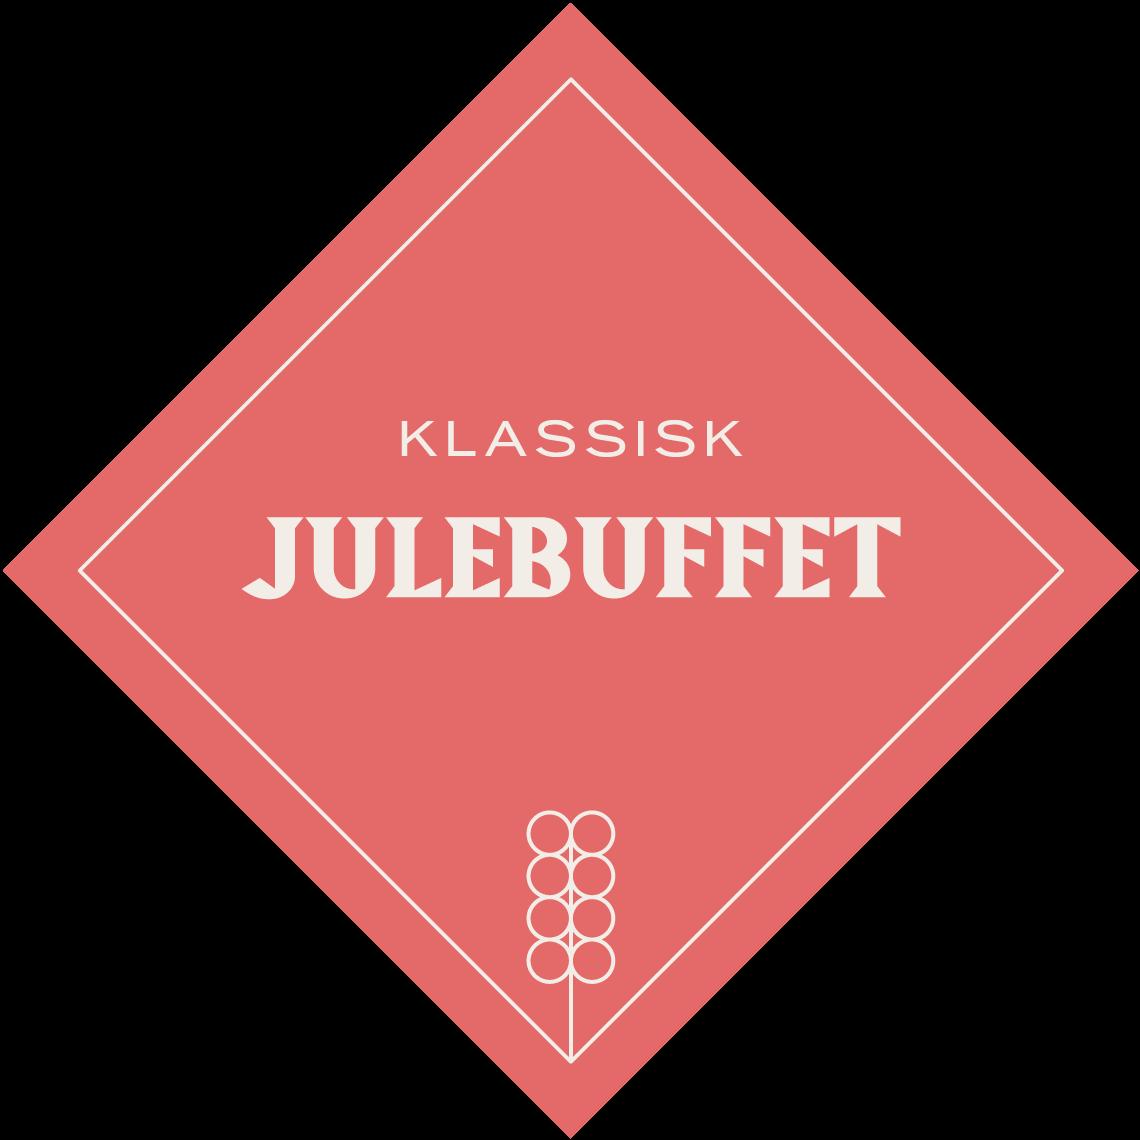 Meny-Julebuffet-Klassisk.png